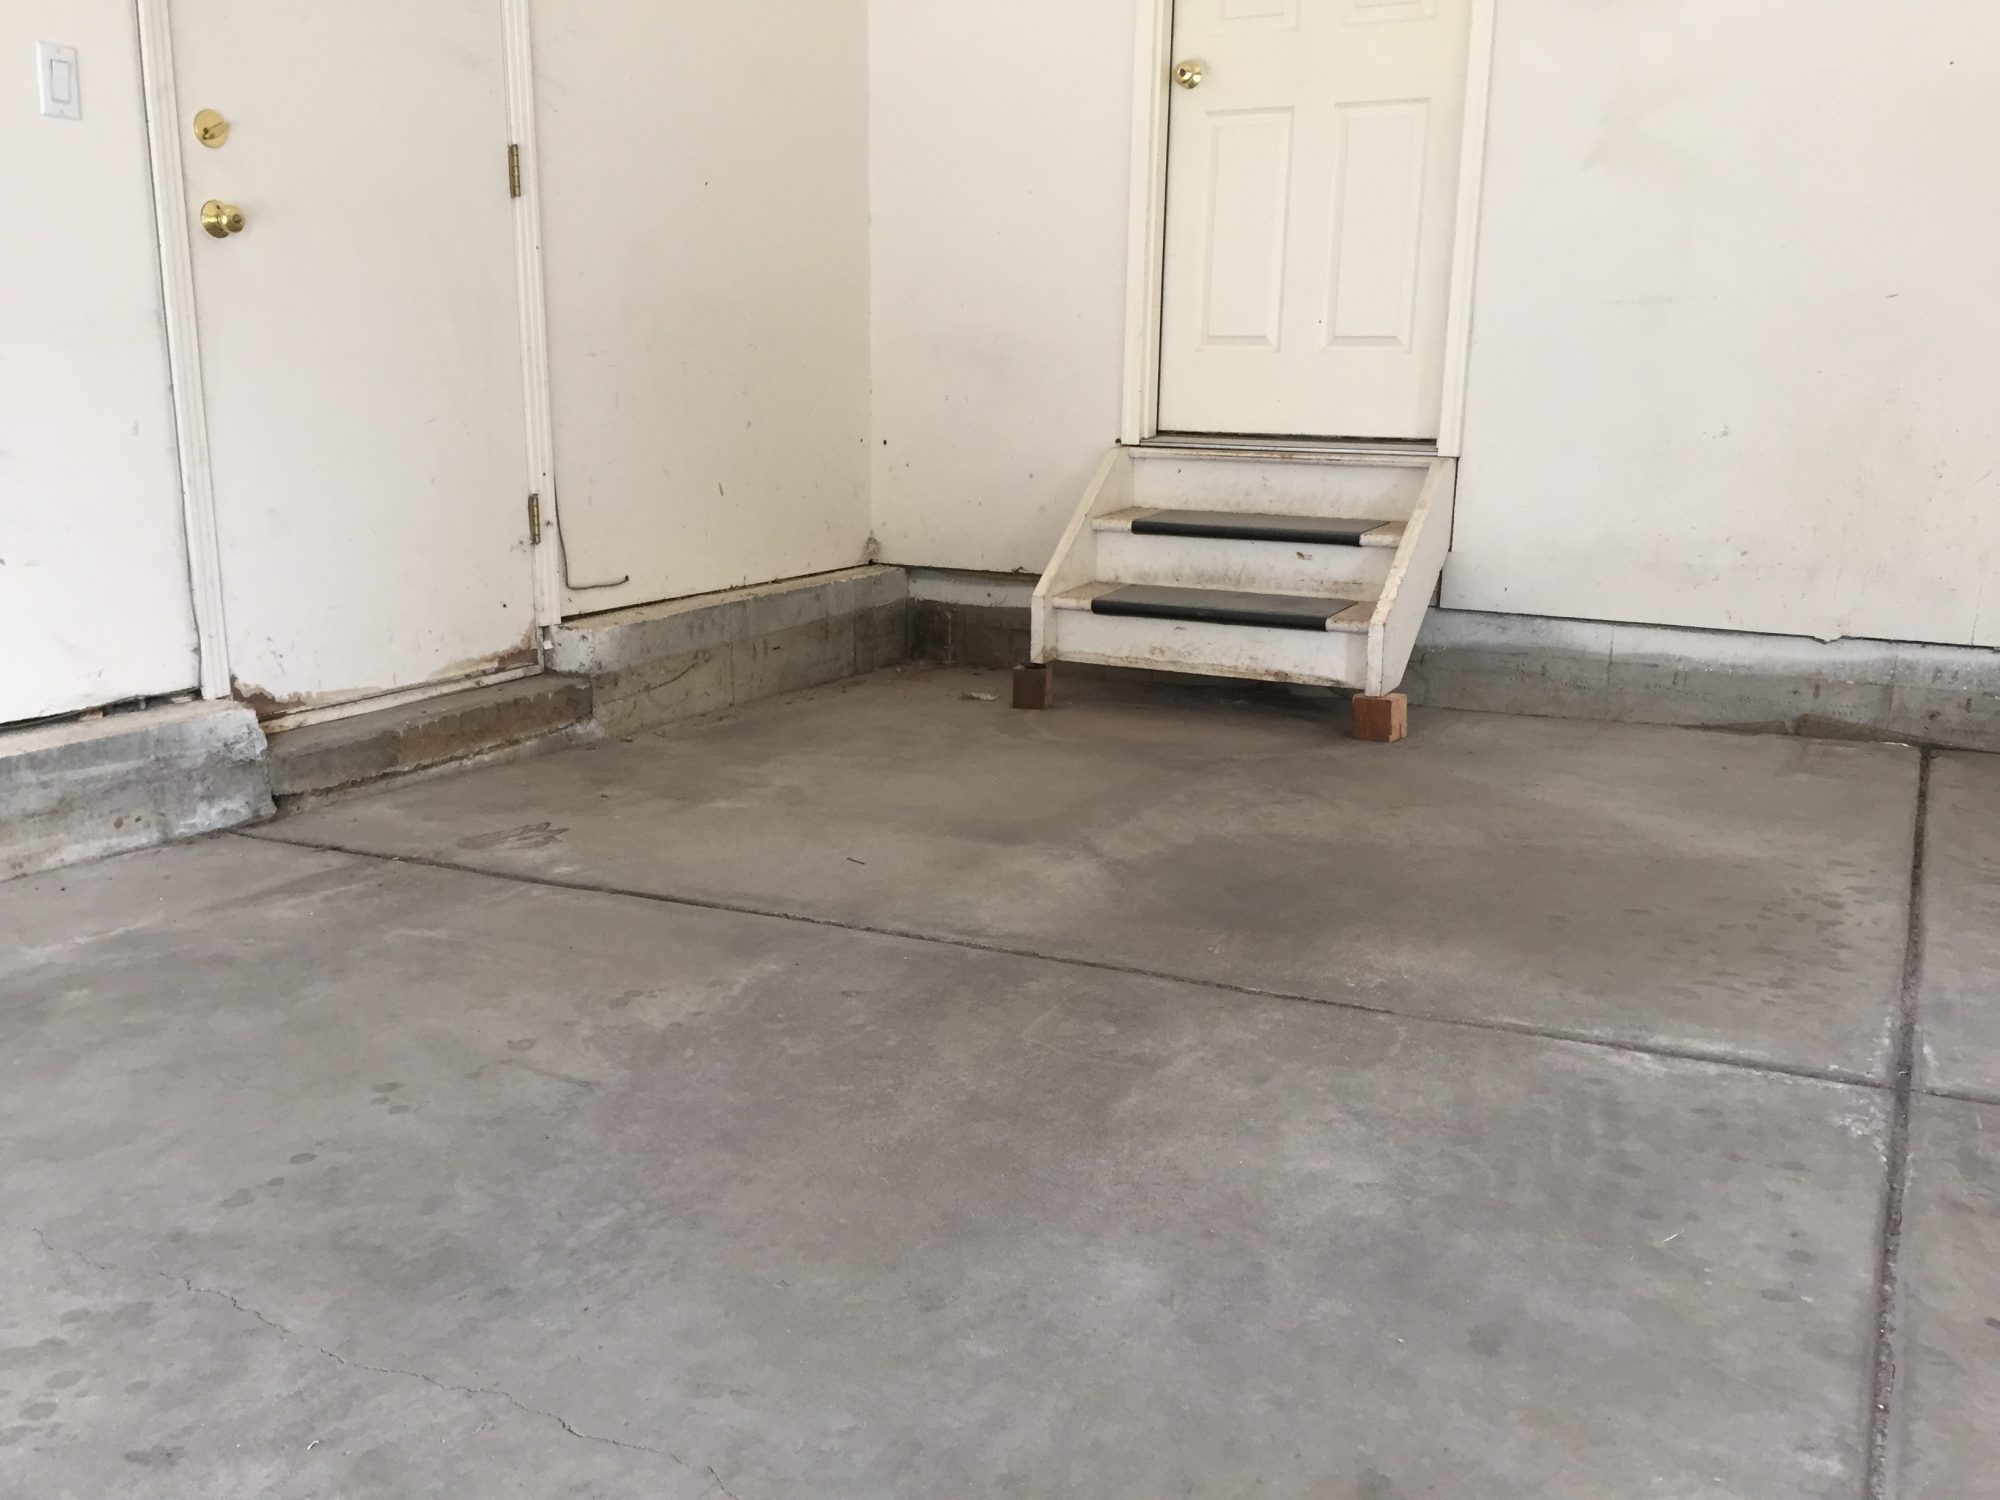 Garage in need of concrete raising